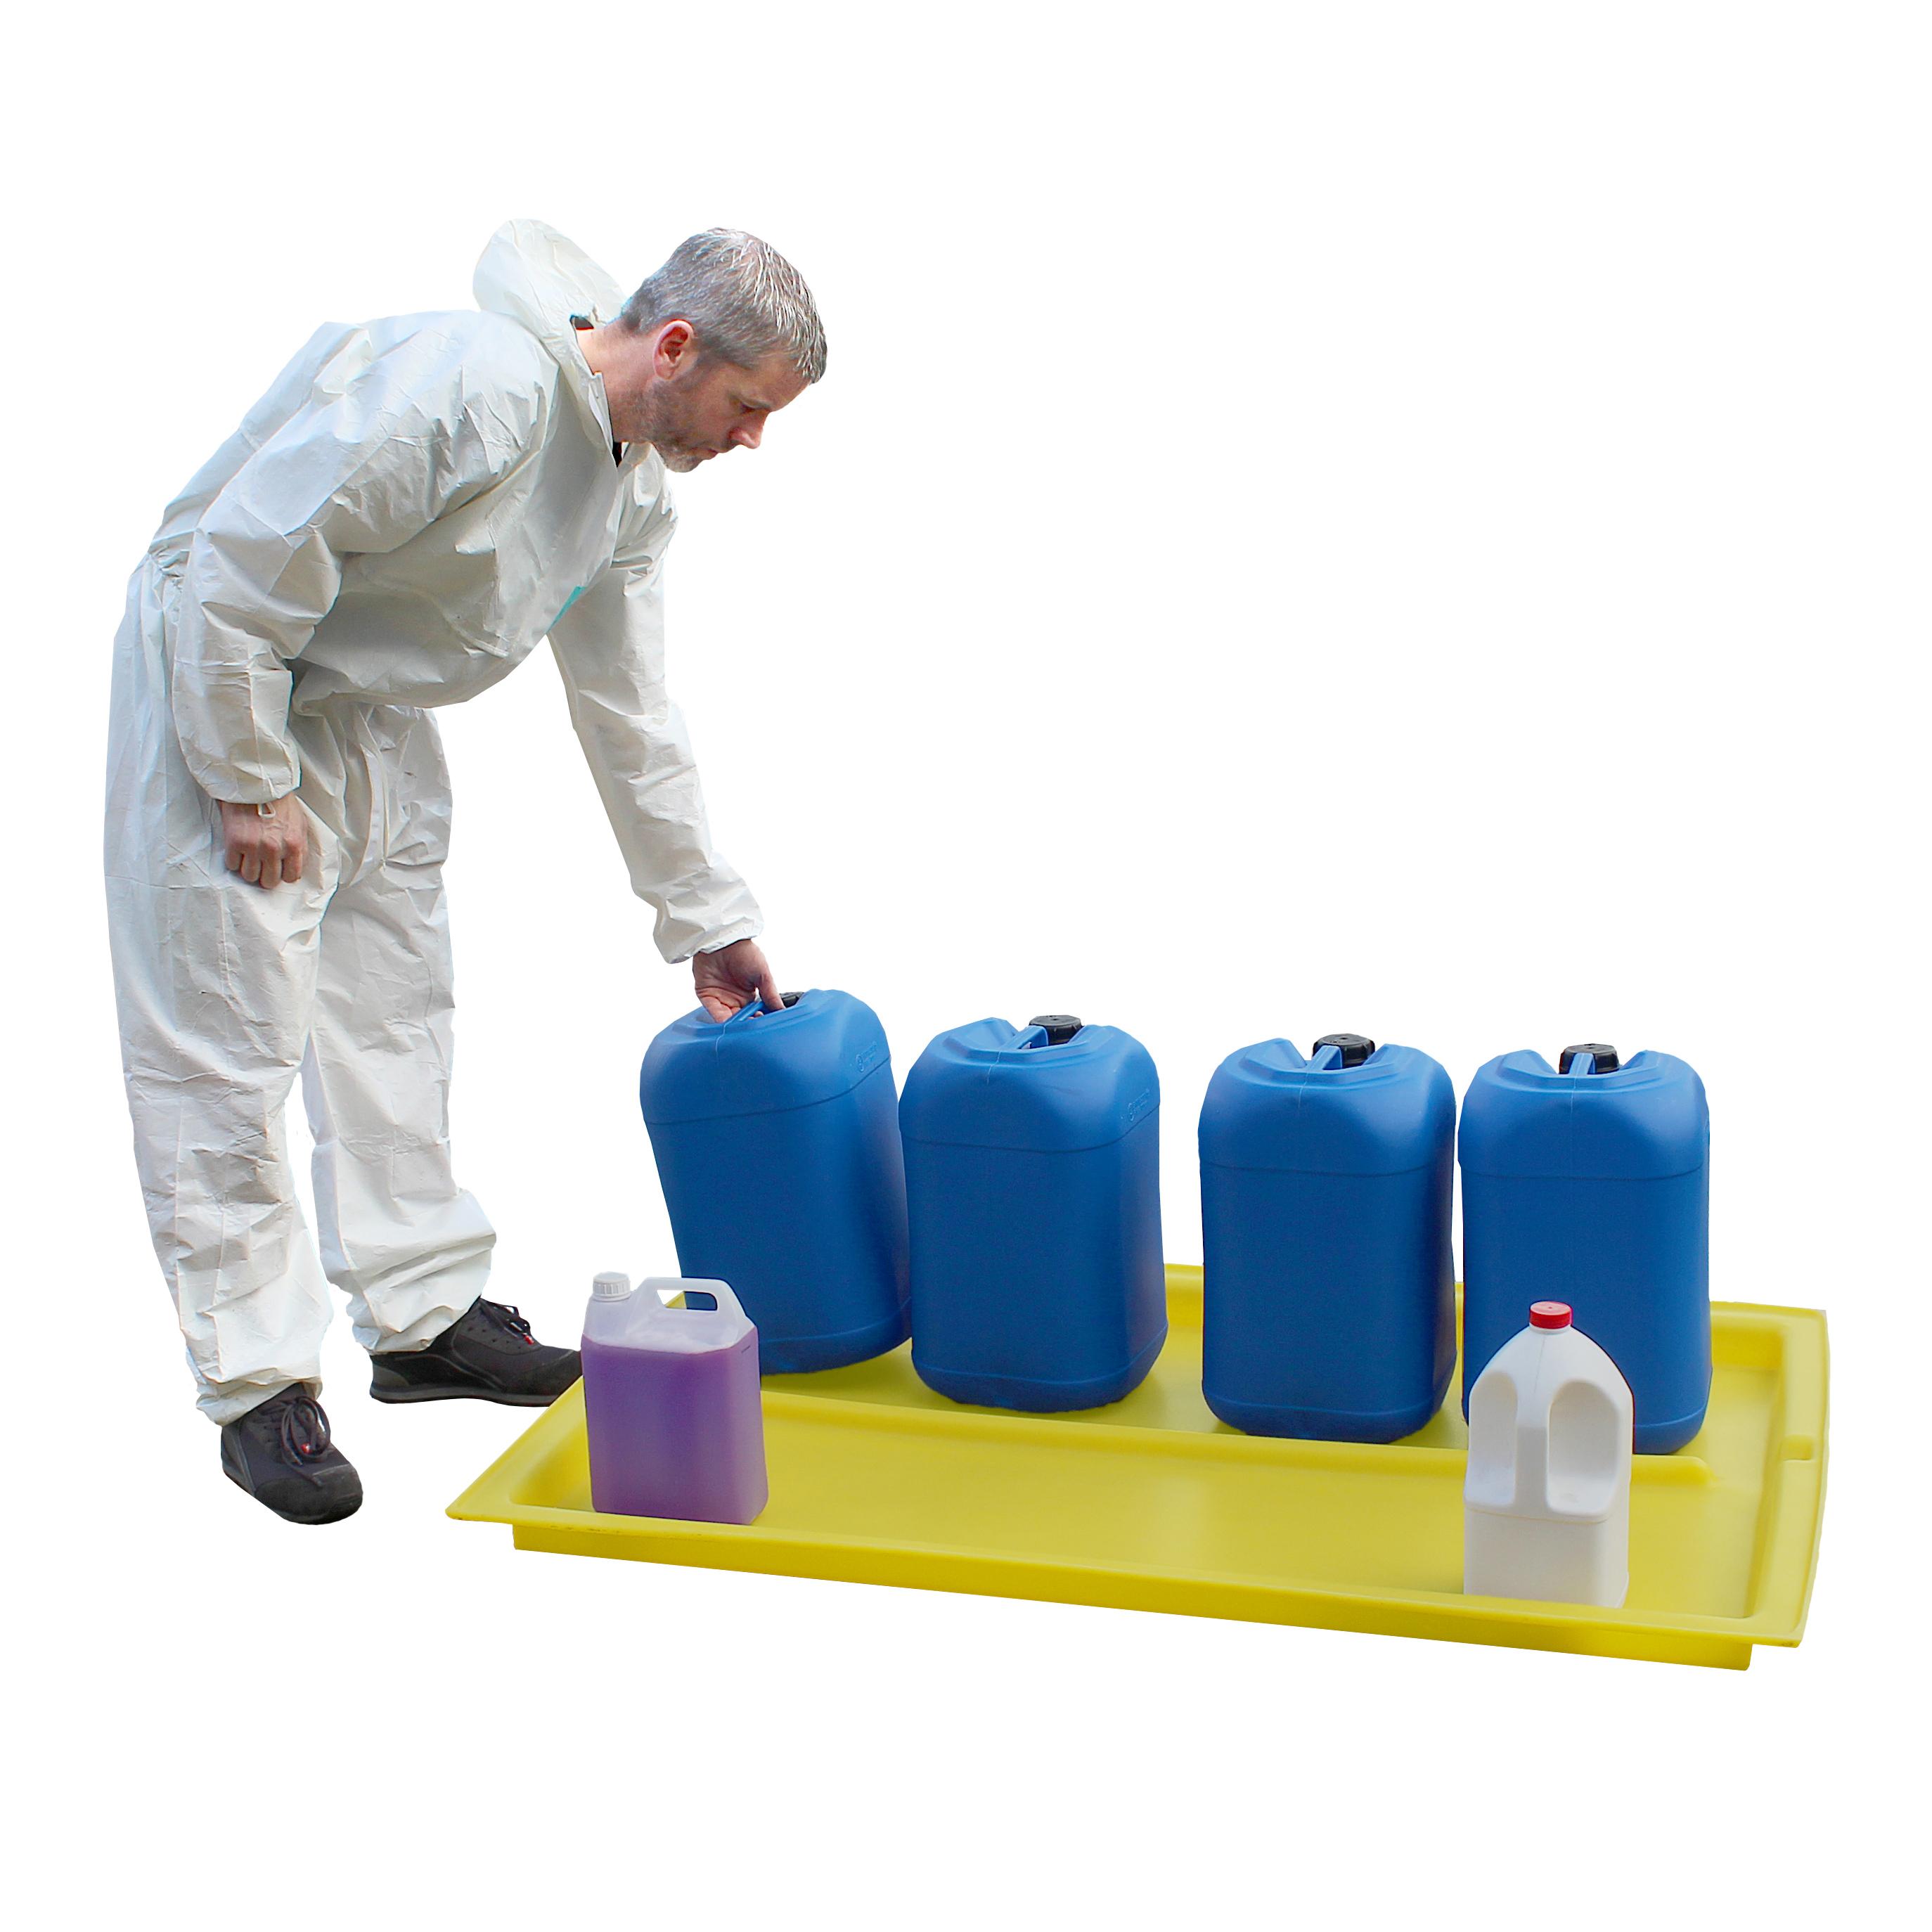 Spill Tray TTL A